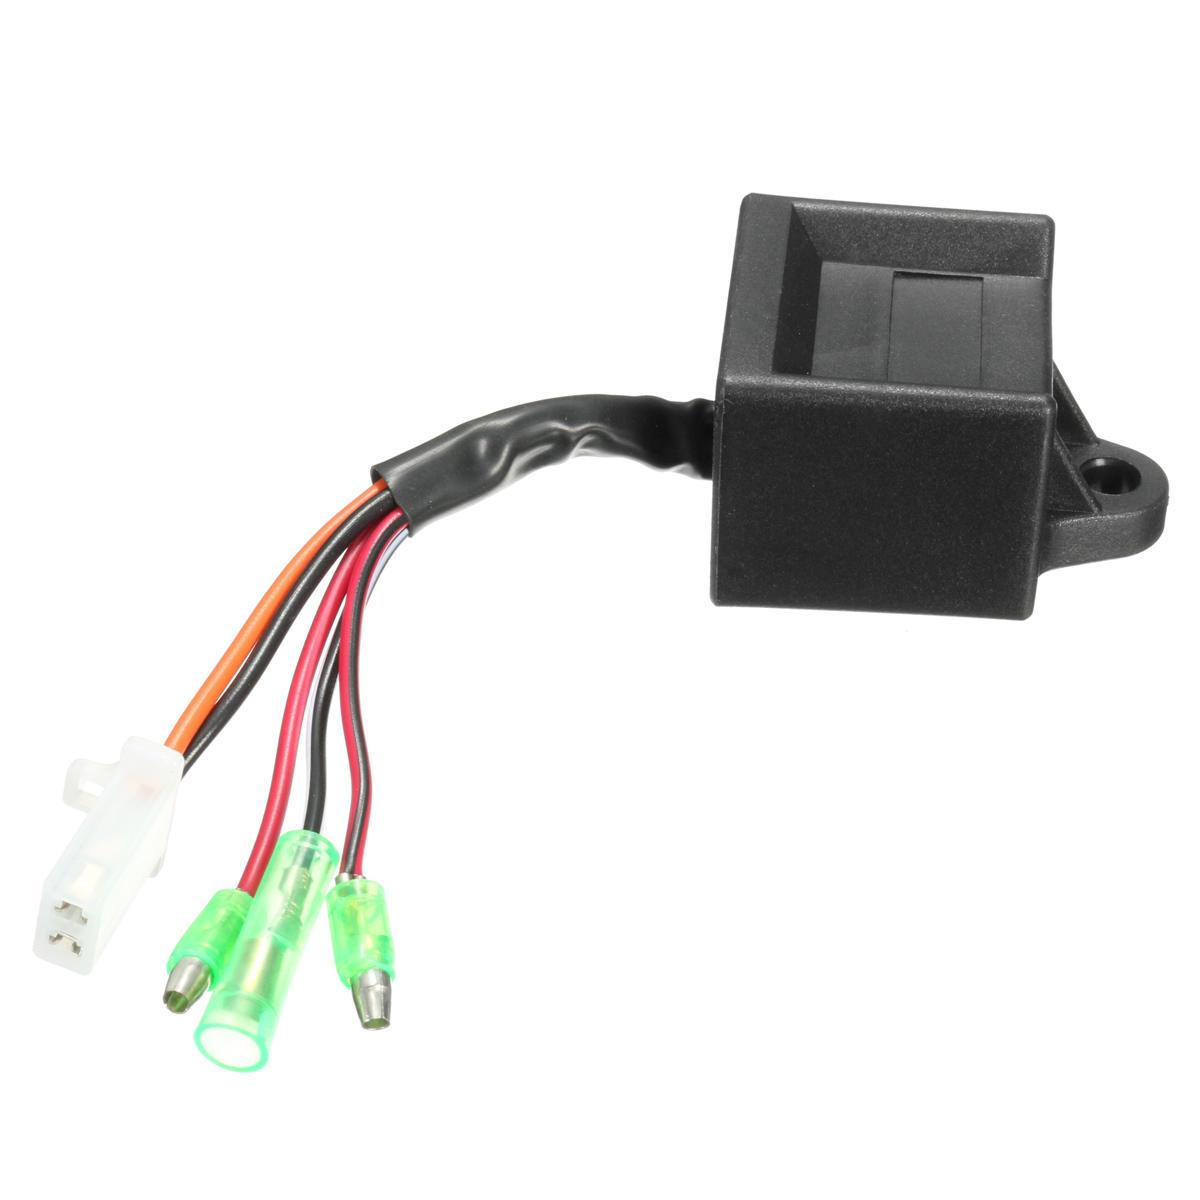 hight resolution of ignition cdi box for polaris scrambler 50cc 90cc 100cc 110cc 2 stroke atv